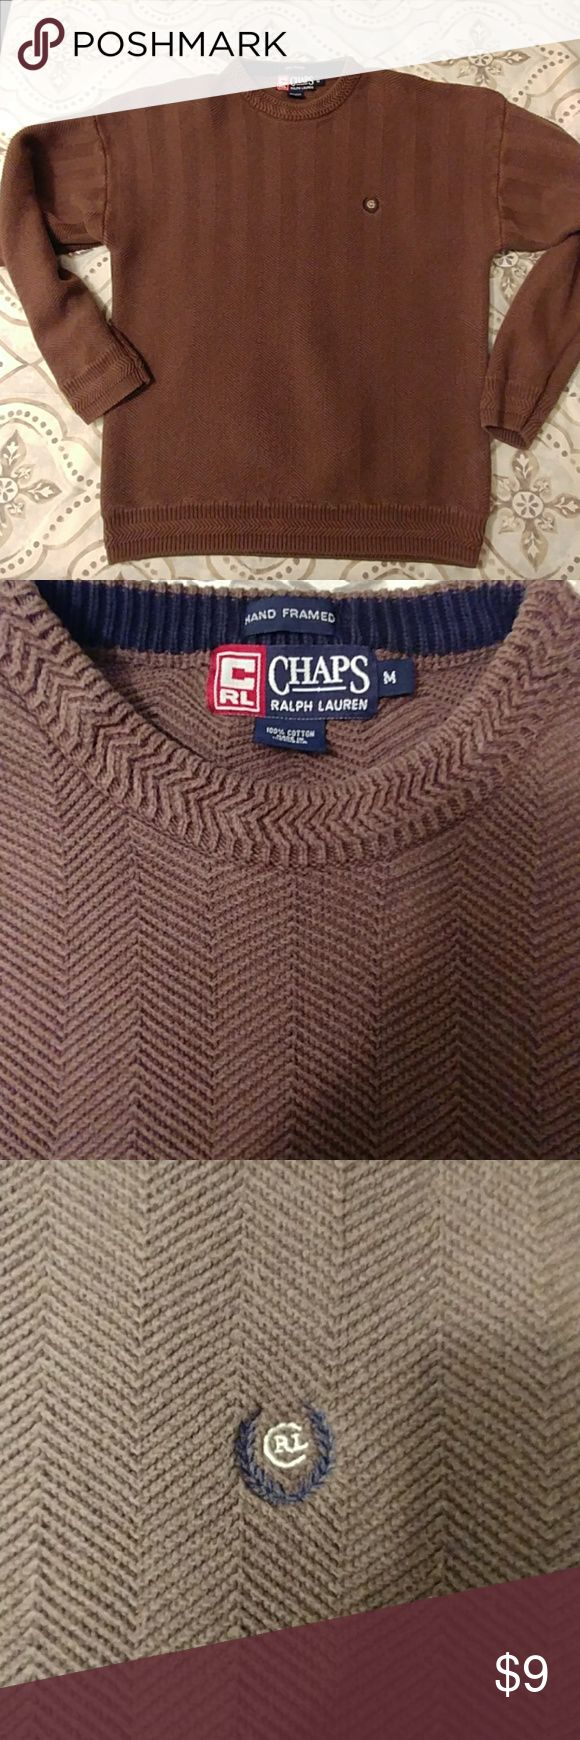 Men's Vintage Chaps Ralph Lauren Sweater Men's Vintage Chaps Ralph Lauren Sweater. Gently Used. Size Medium. Heavyweight. Dark Taupe, Brownish Color. Chaps Ralph Lauren Sweaters